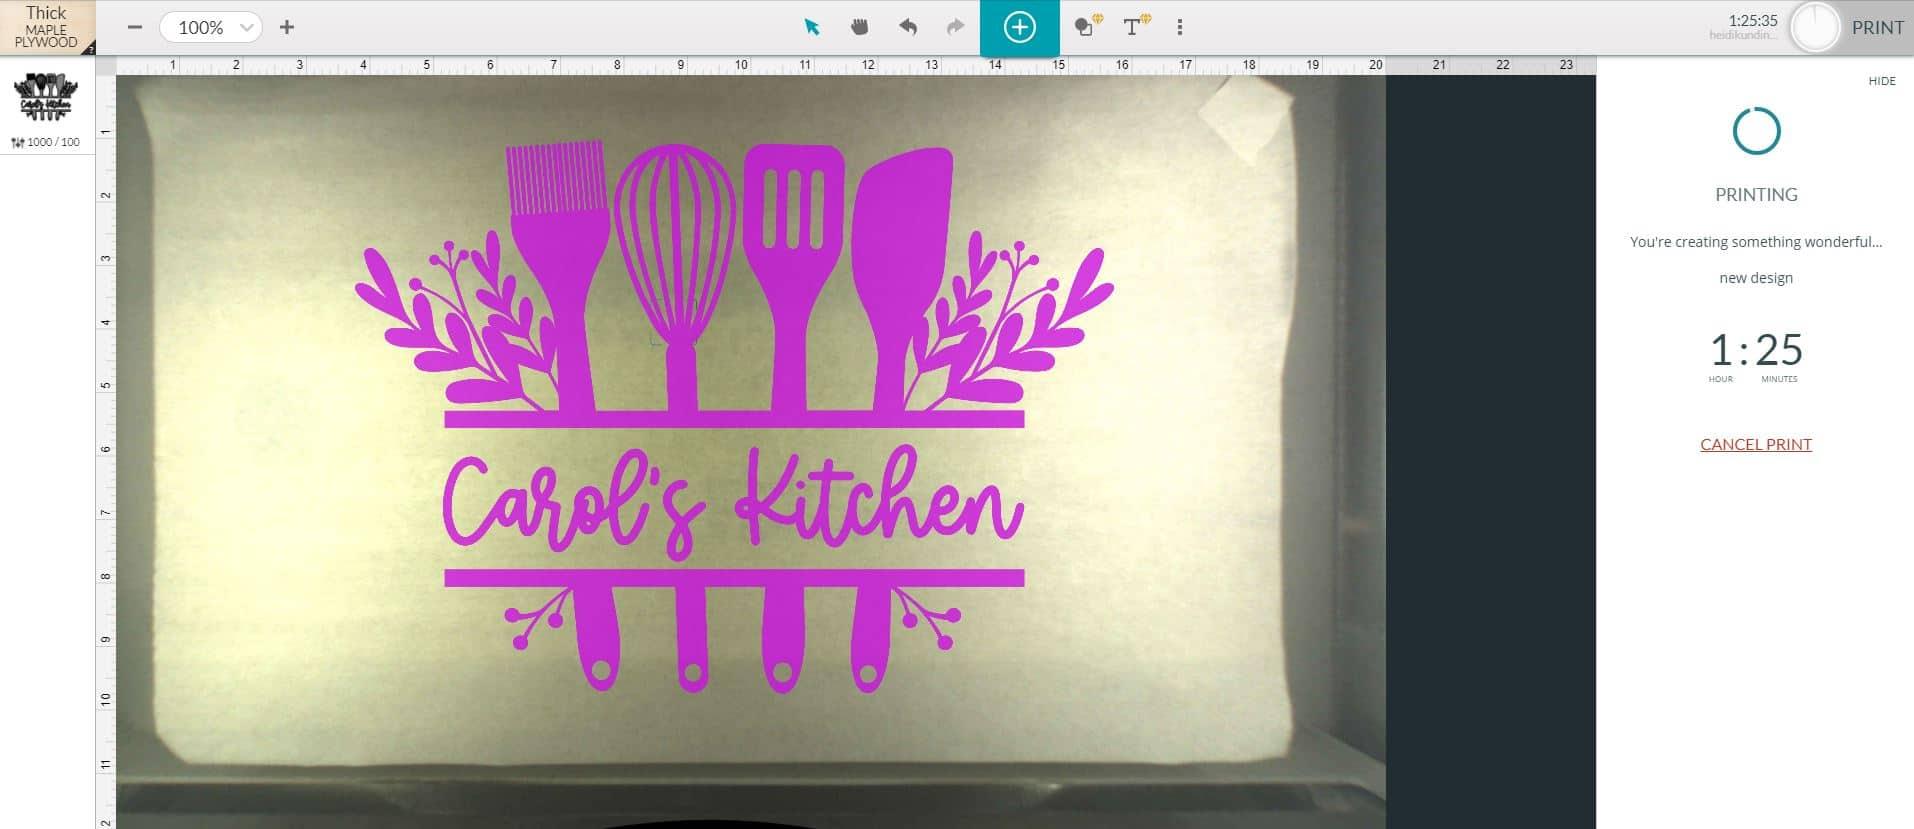 Screenshot of Glowforge App Software and Cutting Board Design